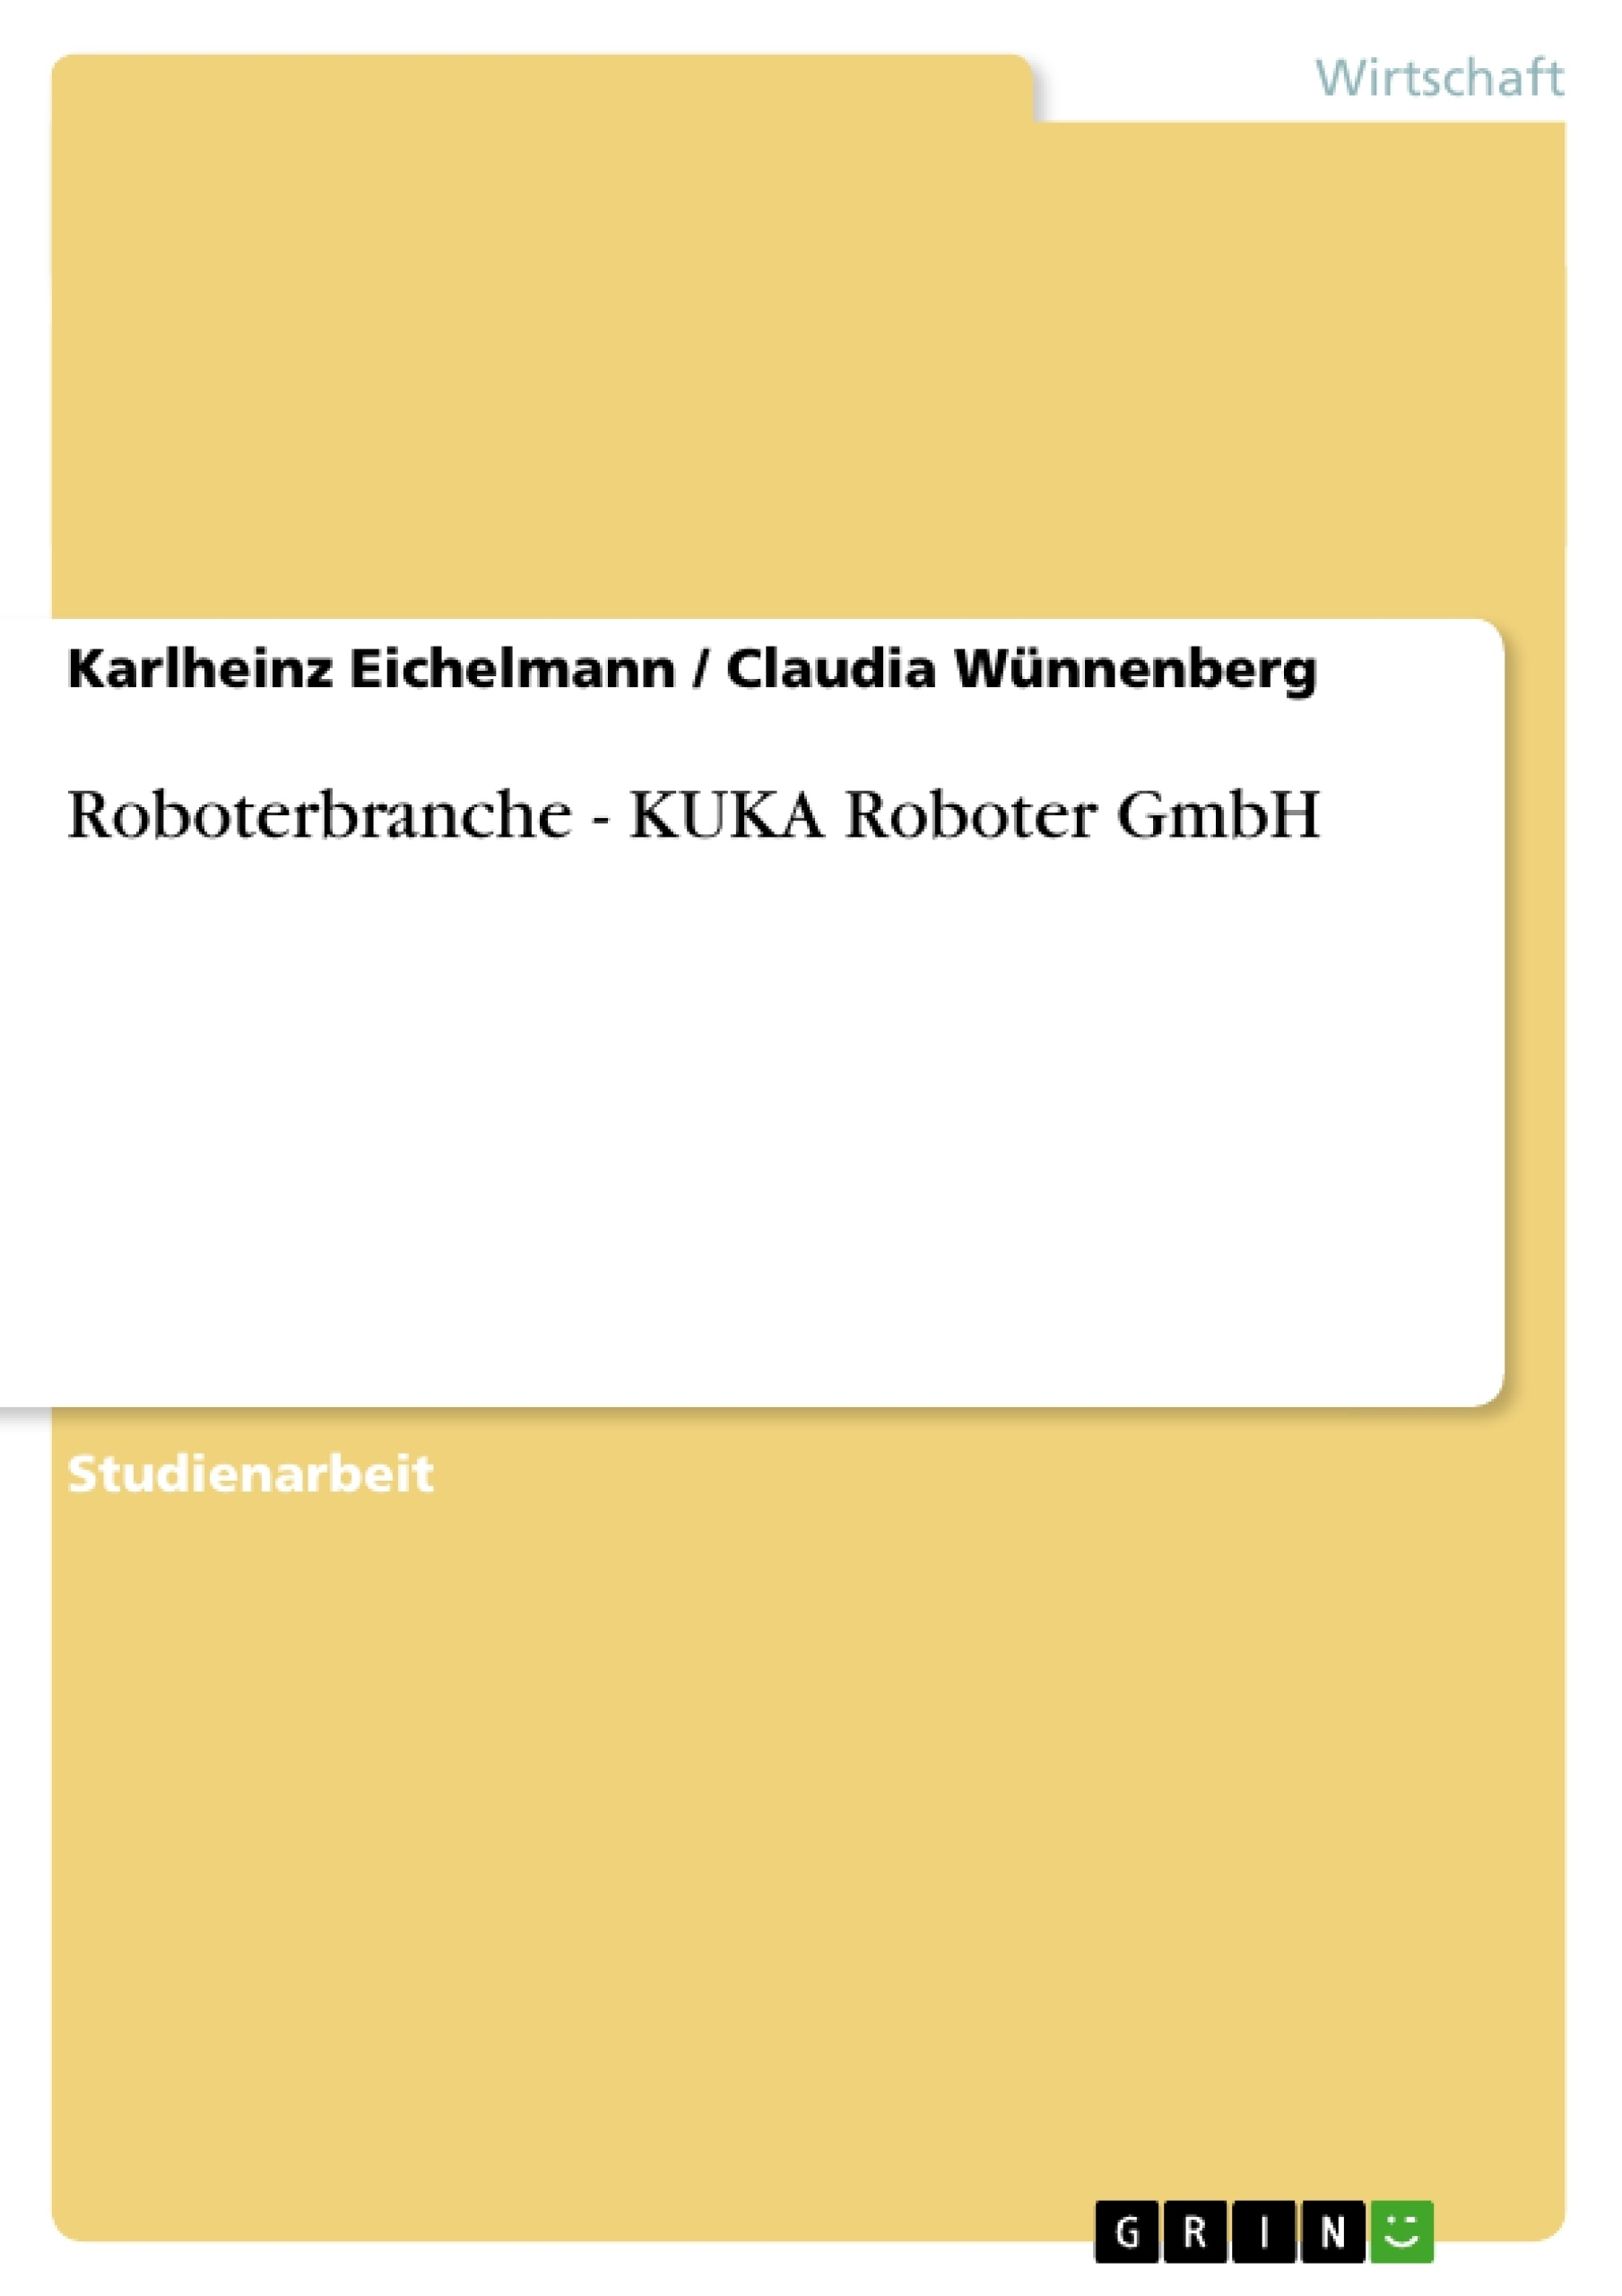 Titel: Roboterbranche - KUKA Roboter GmbH